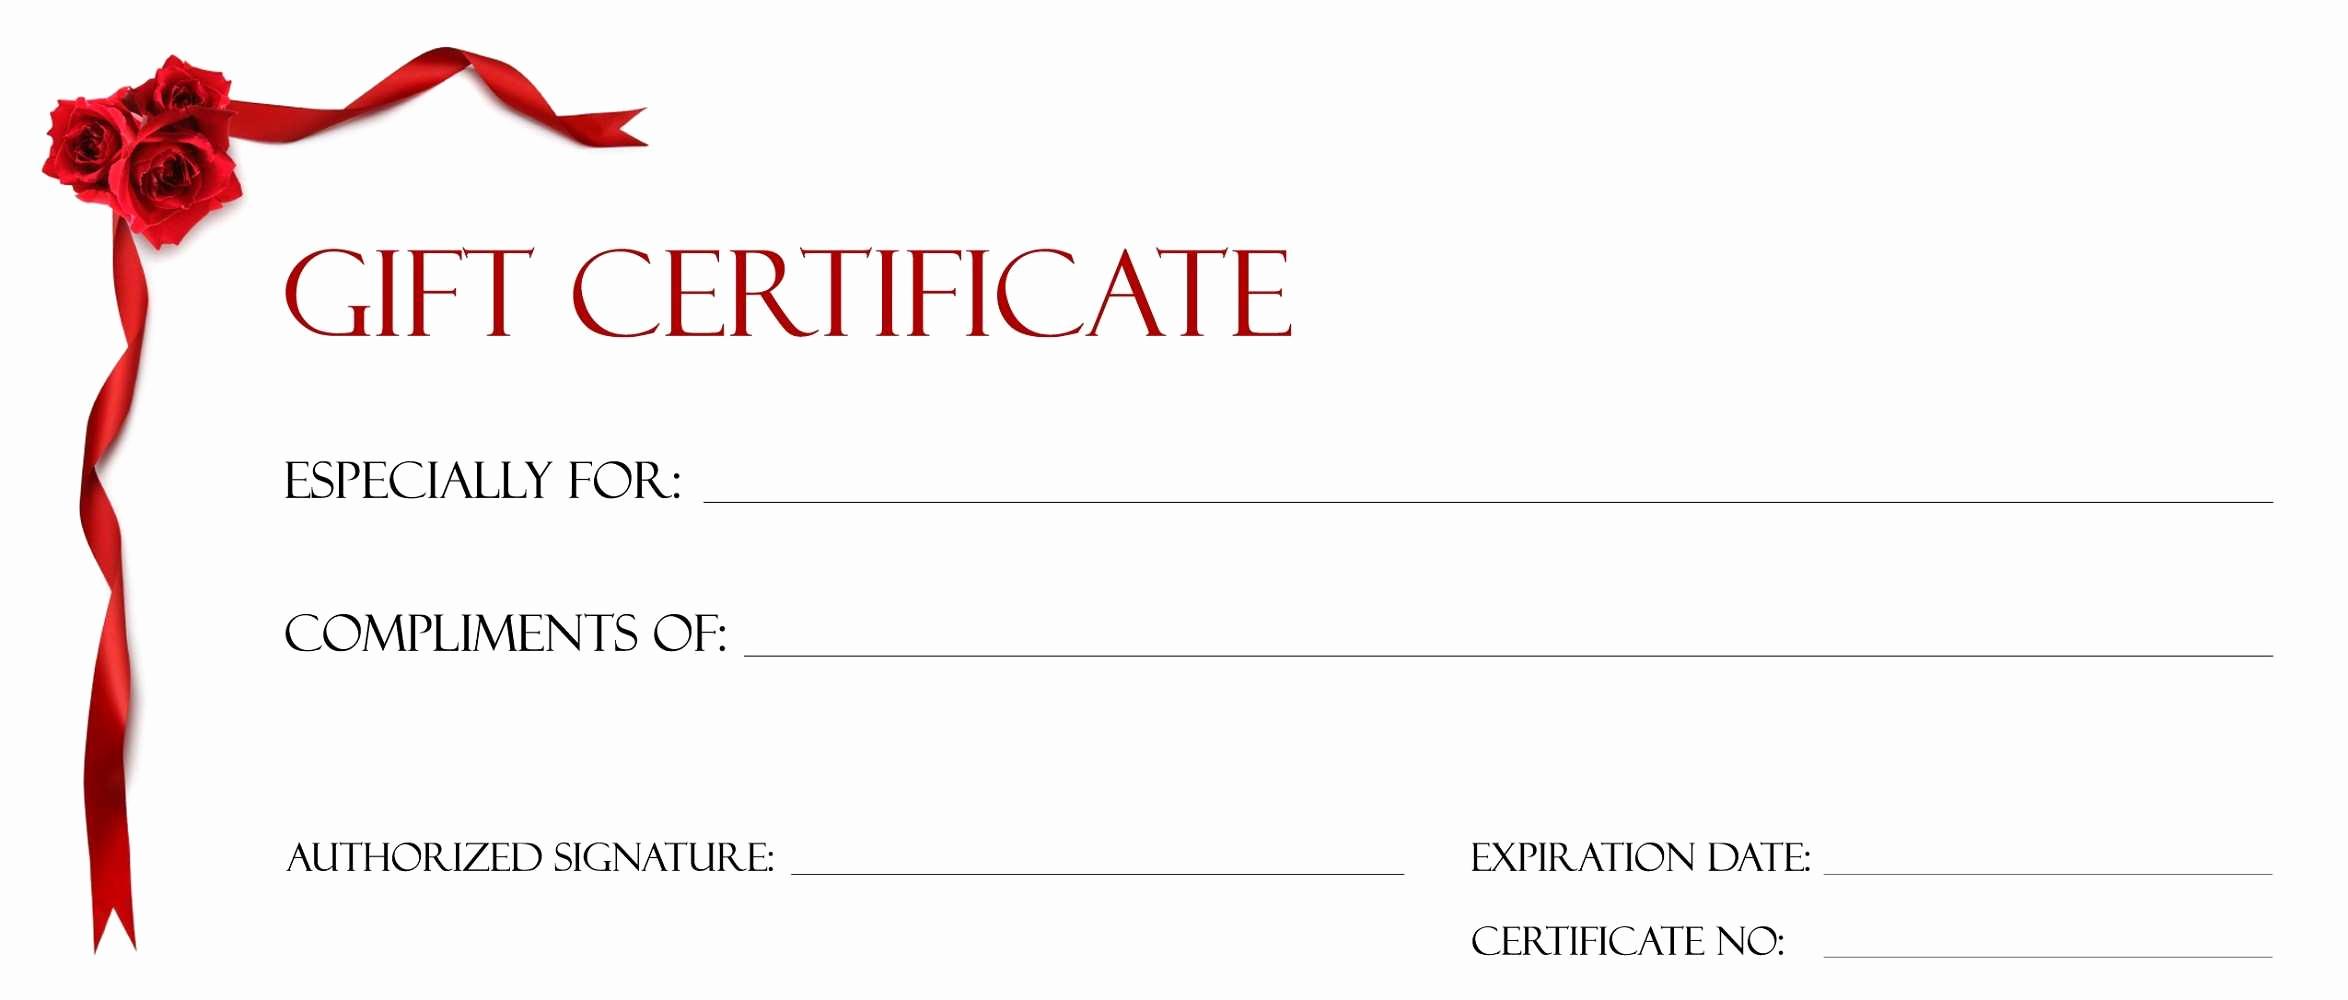 Makeup Gift Certificate Template Beautiful Gift Certificate Blank